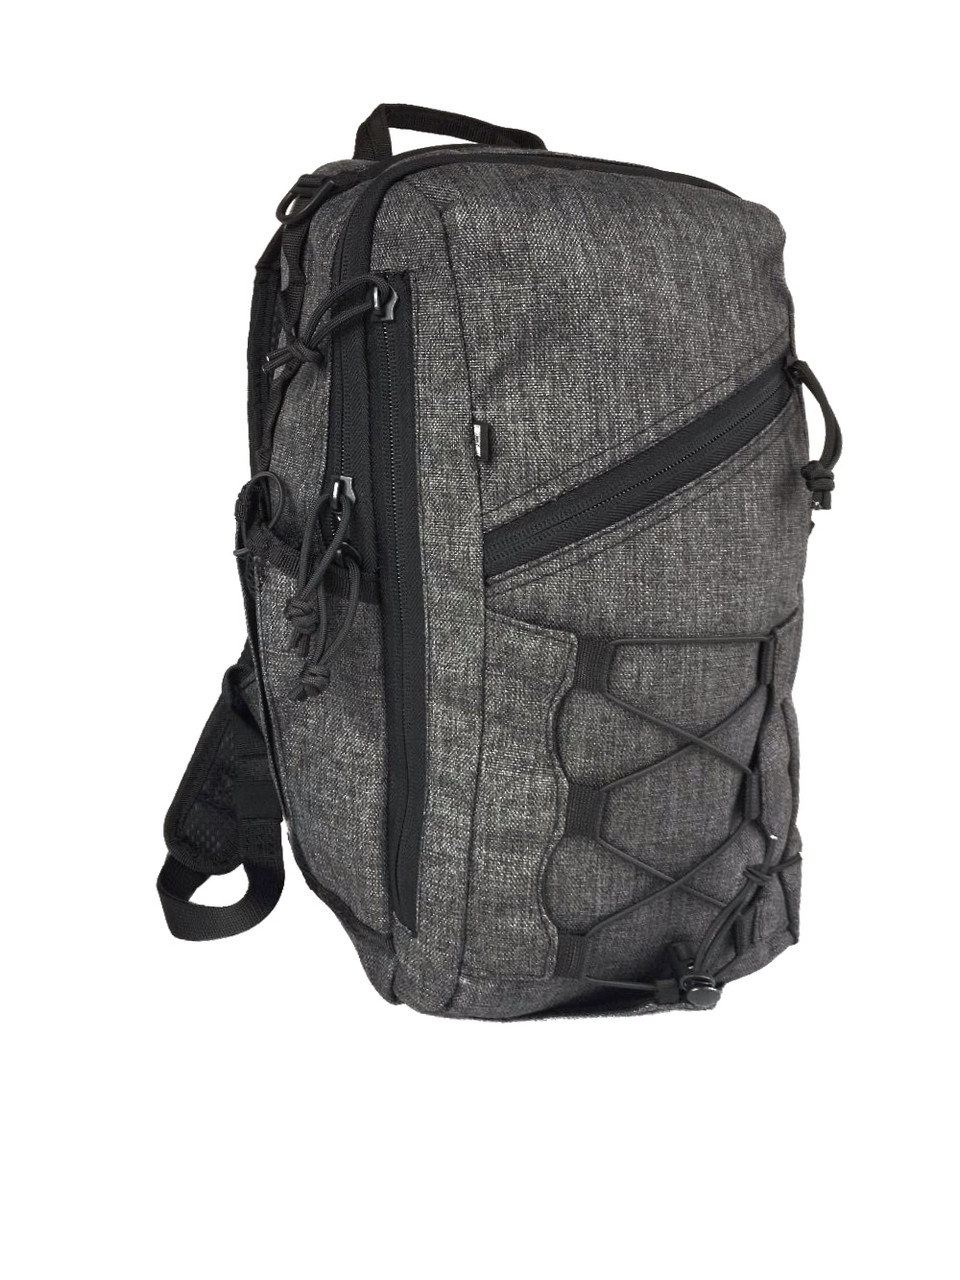 Рюкзак М23 Tot-3 Melange grey